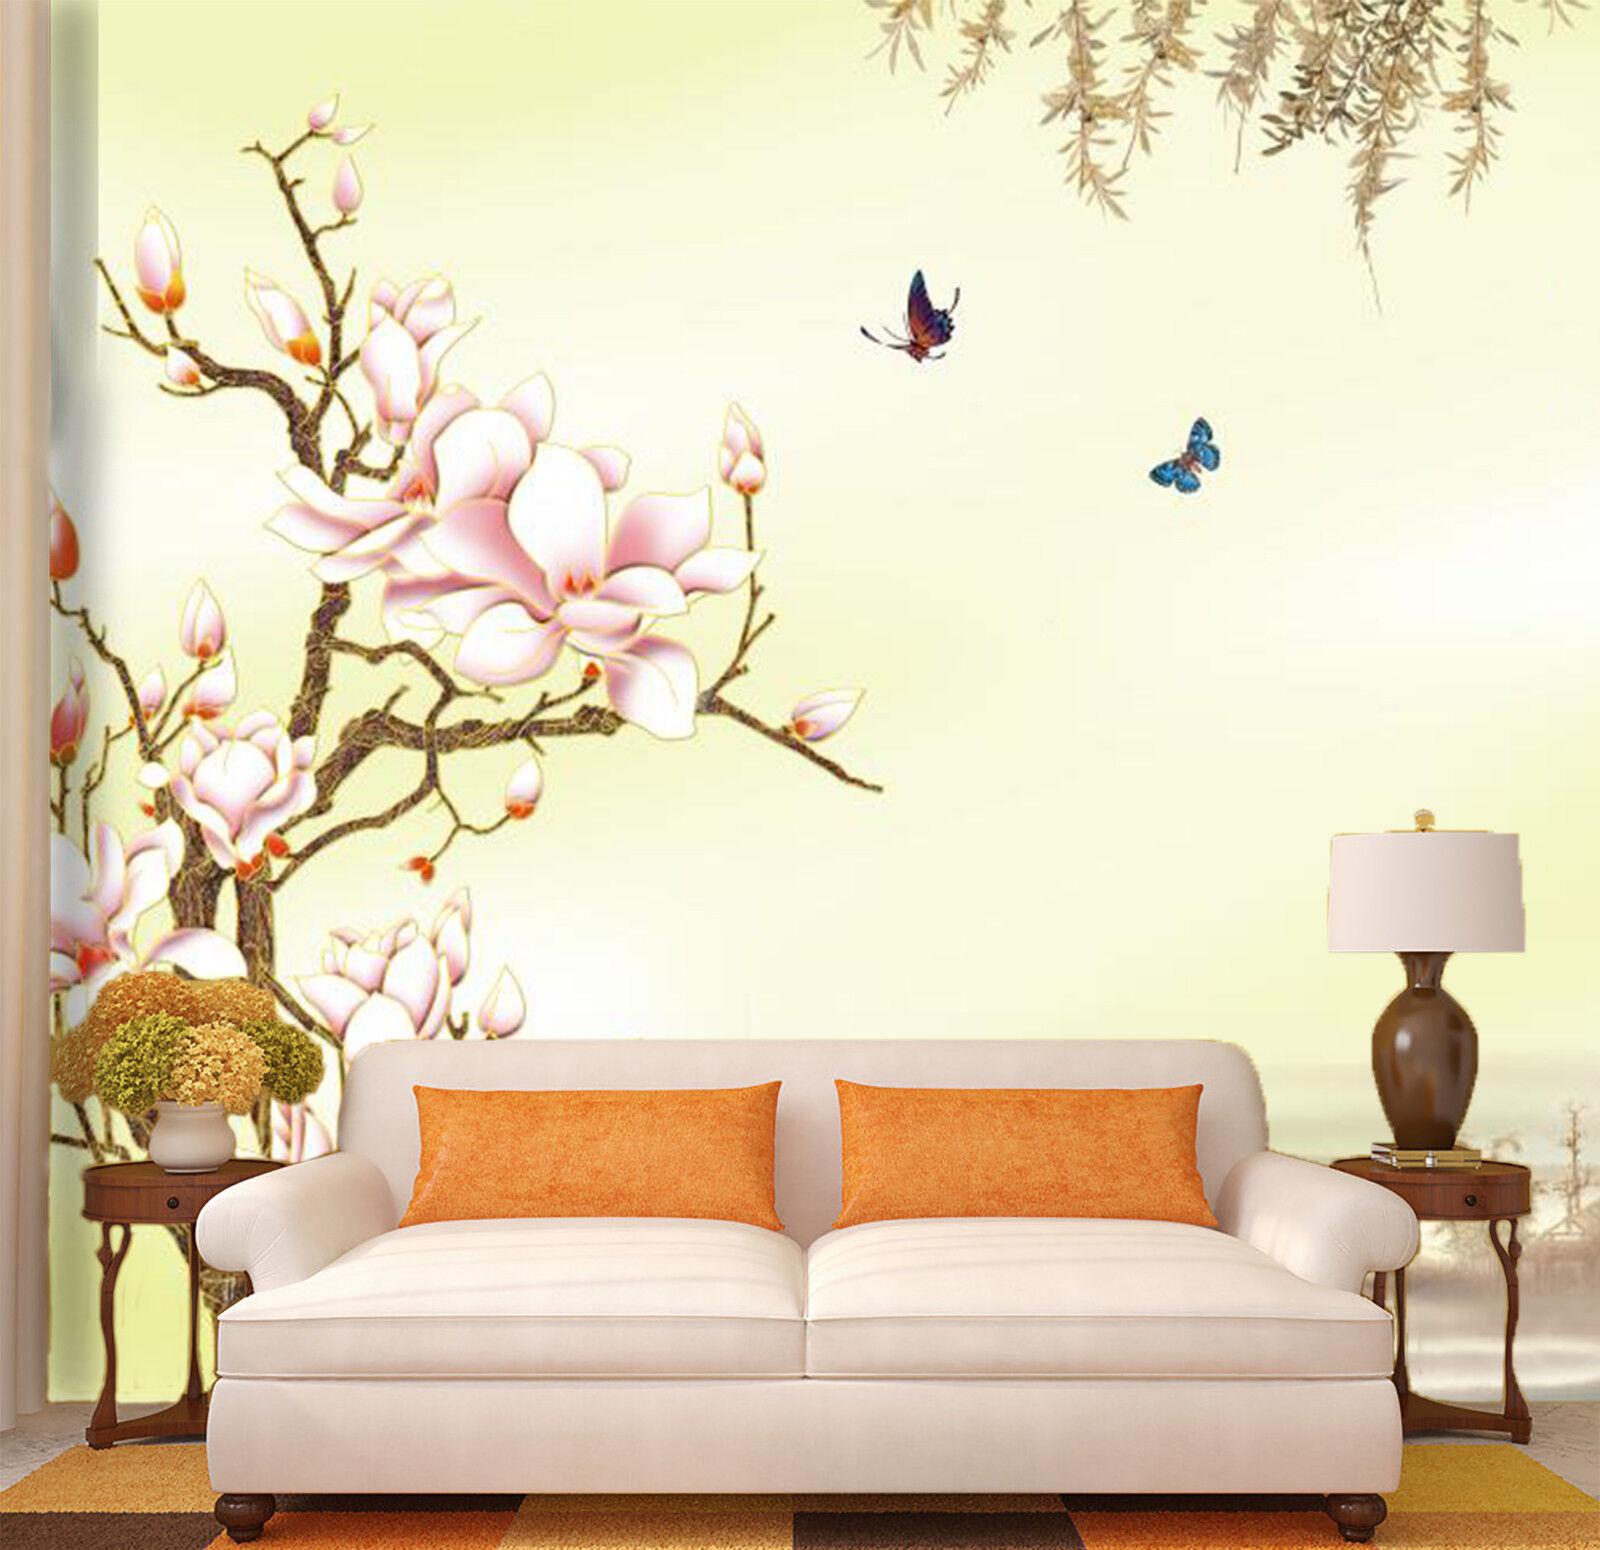 3D Squid Pink 47 Wallpaper Murals Wall Print Wallpaper Mural AJ WALL AU Lemon